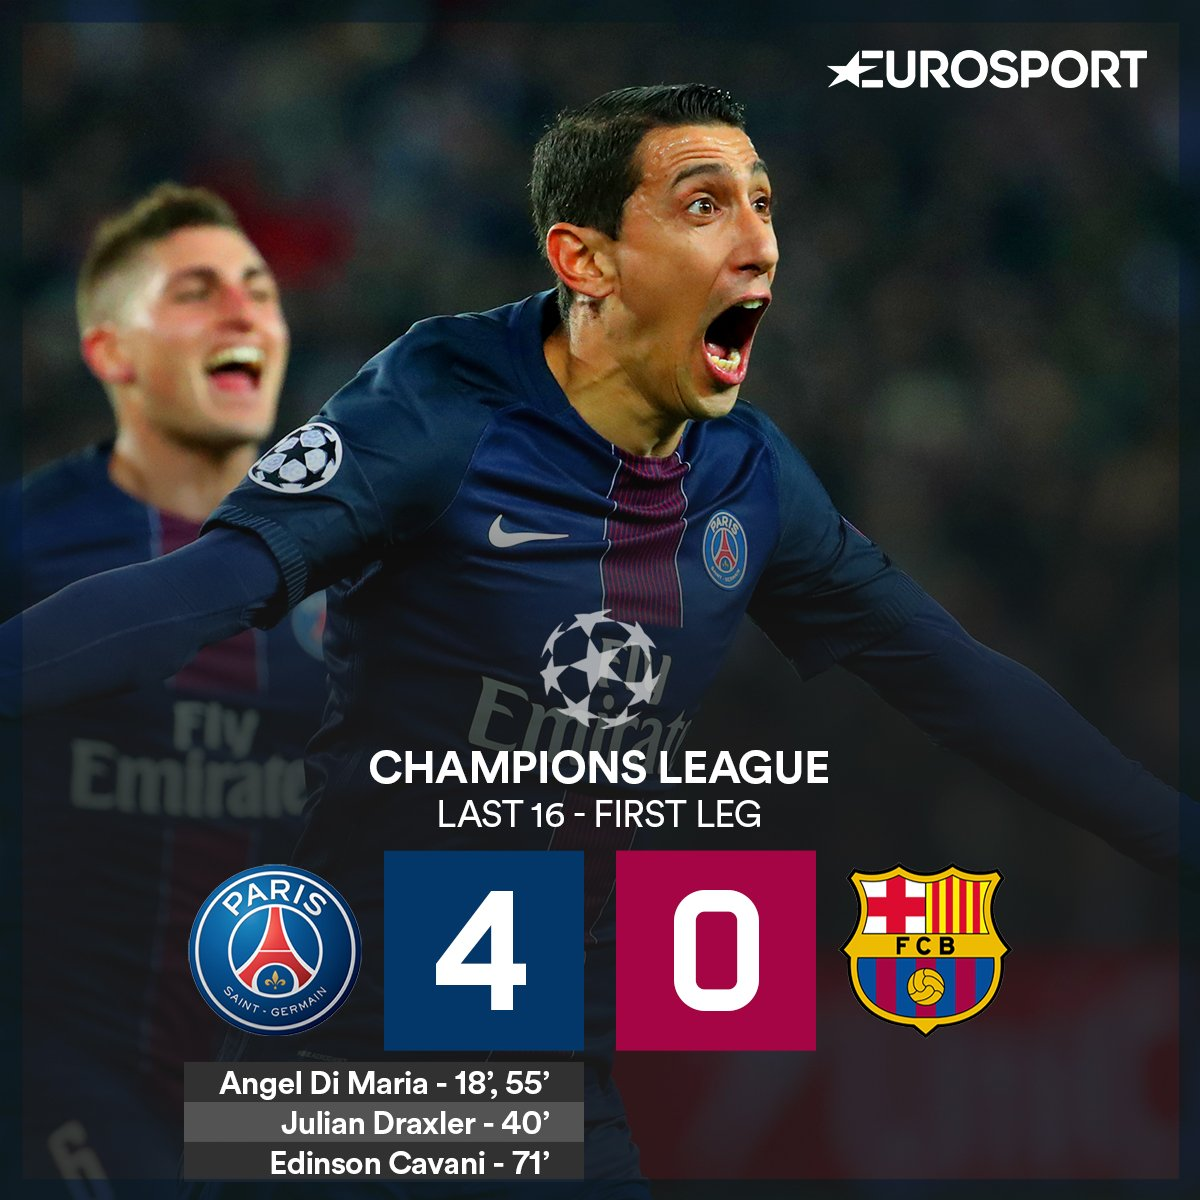 Eurosport Uk בטוויטר Huge Shock Psg 4 0 Fcbarcelona Psg Stun Barcelona With A Famous Victory In Paris Psgfcb